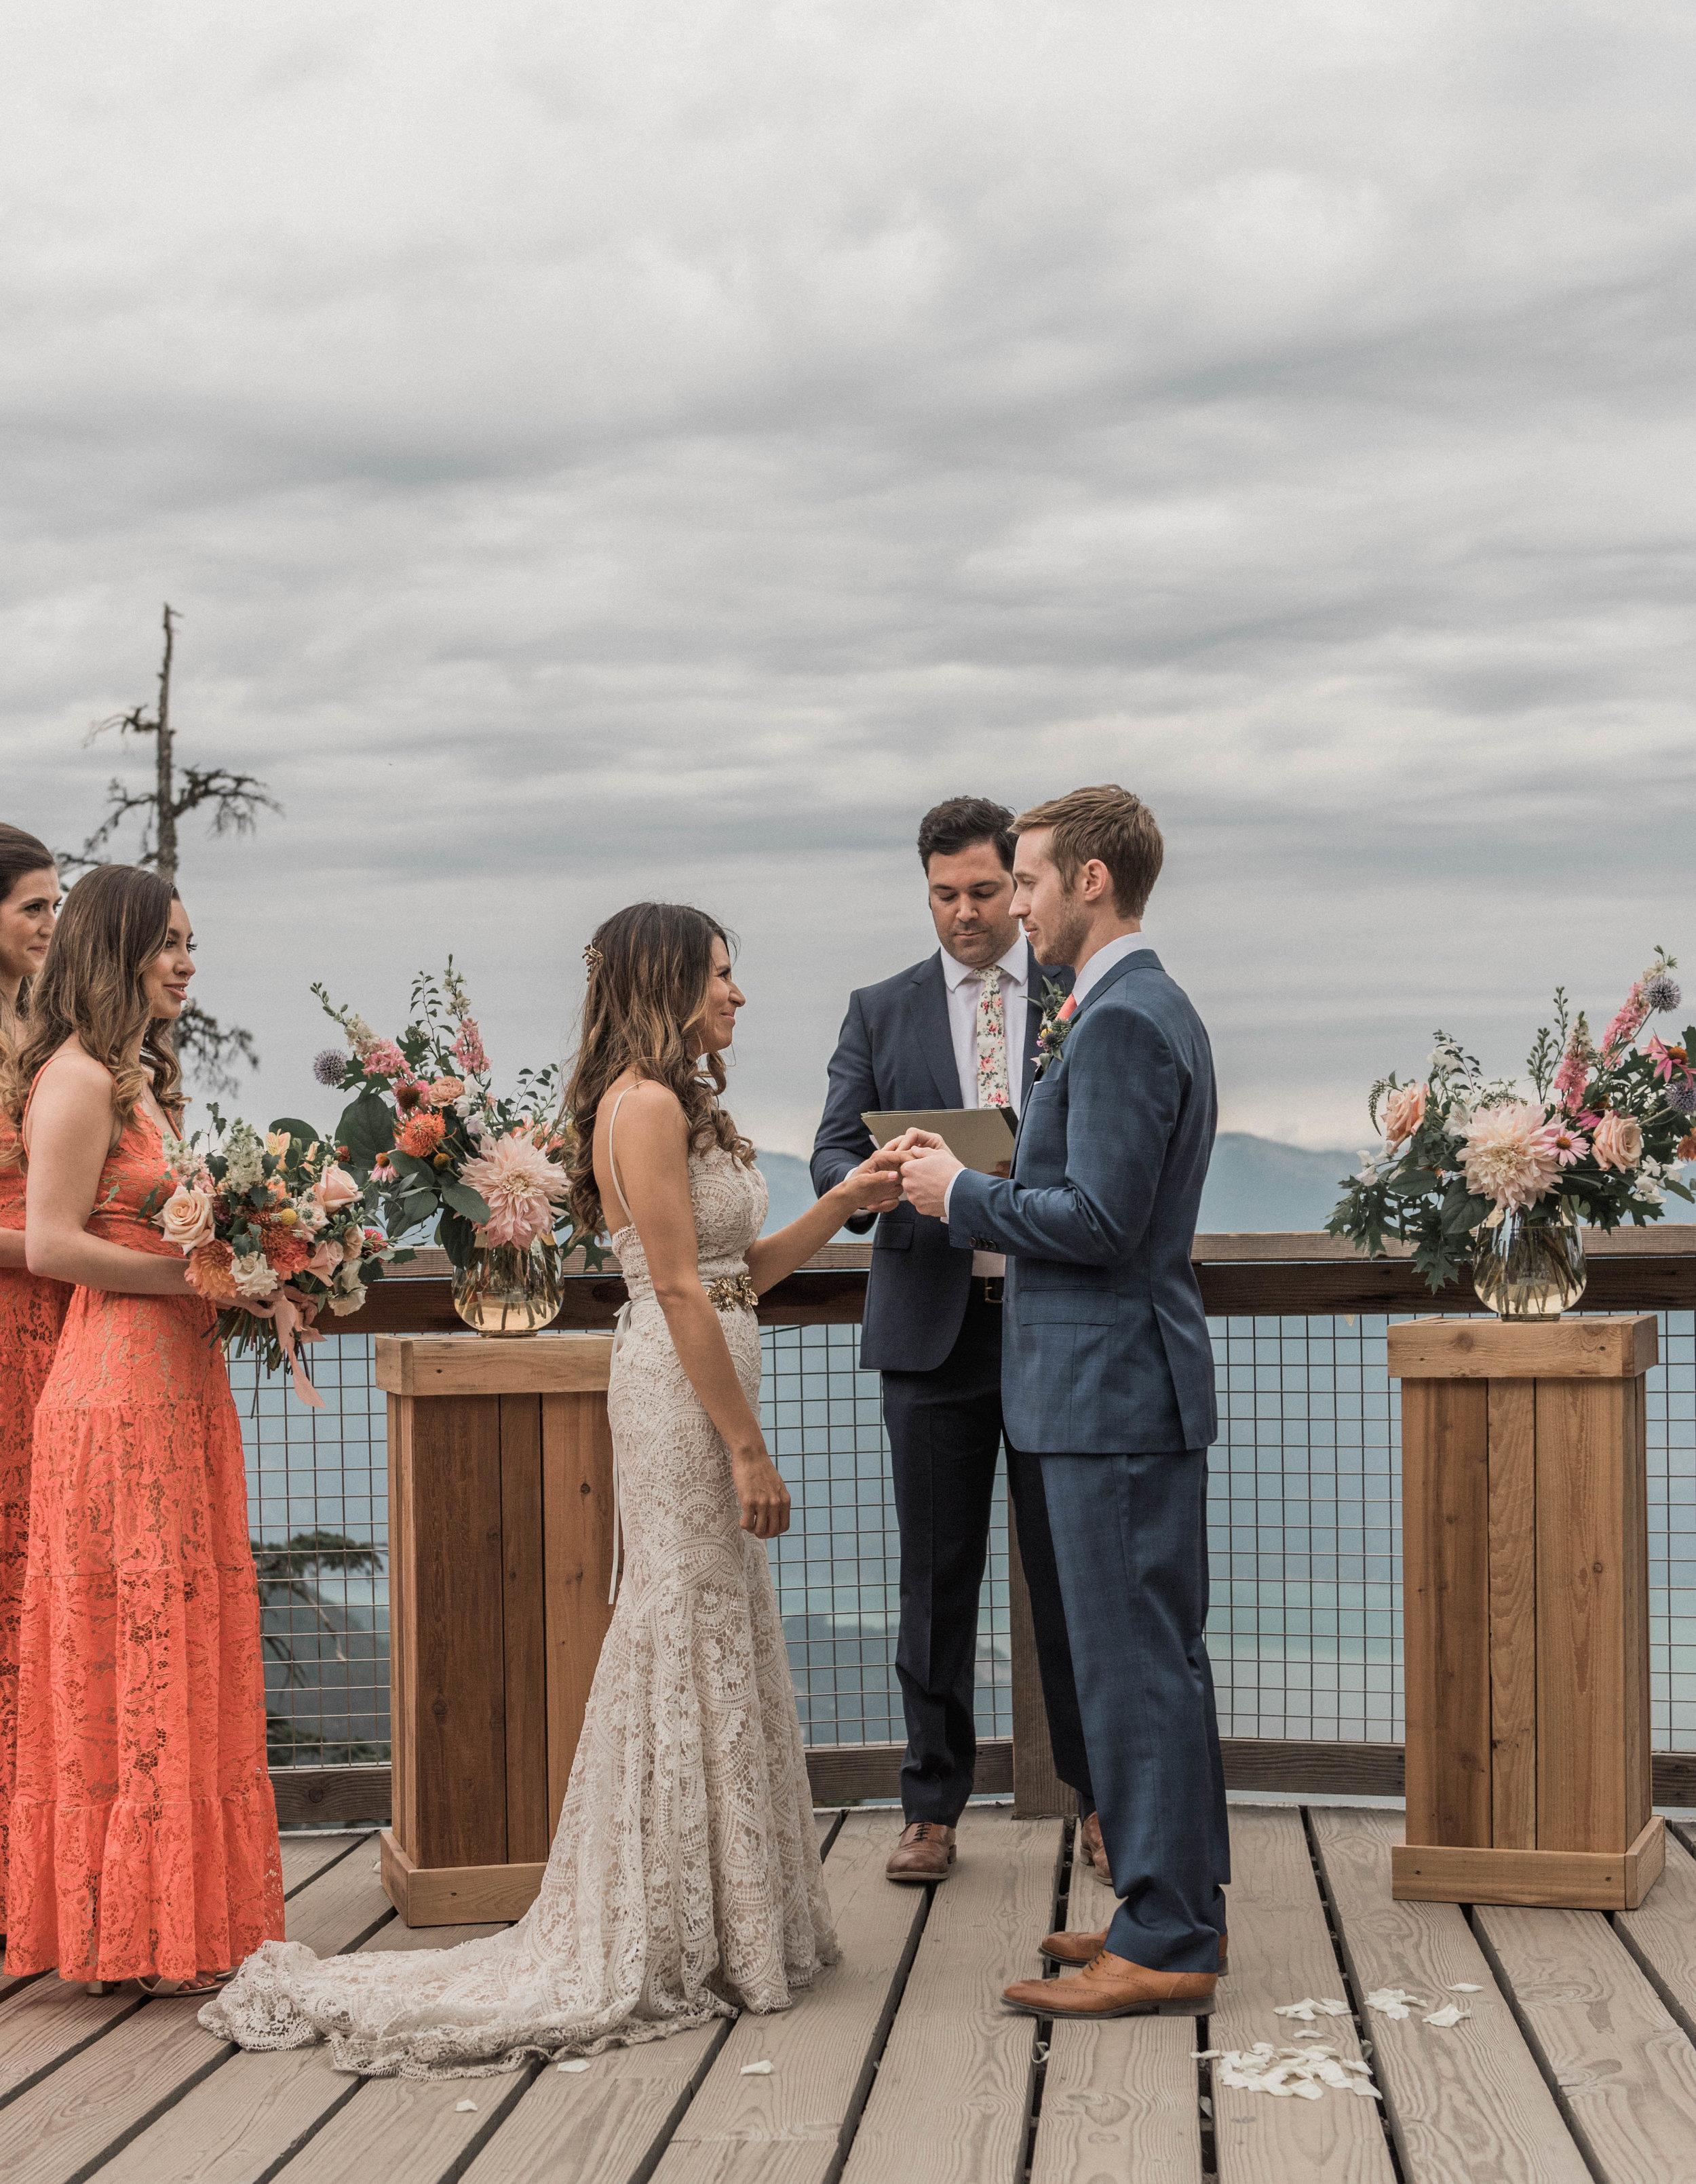 austin-texas-wedding-photography-1778-photographie-92.jpg